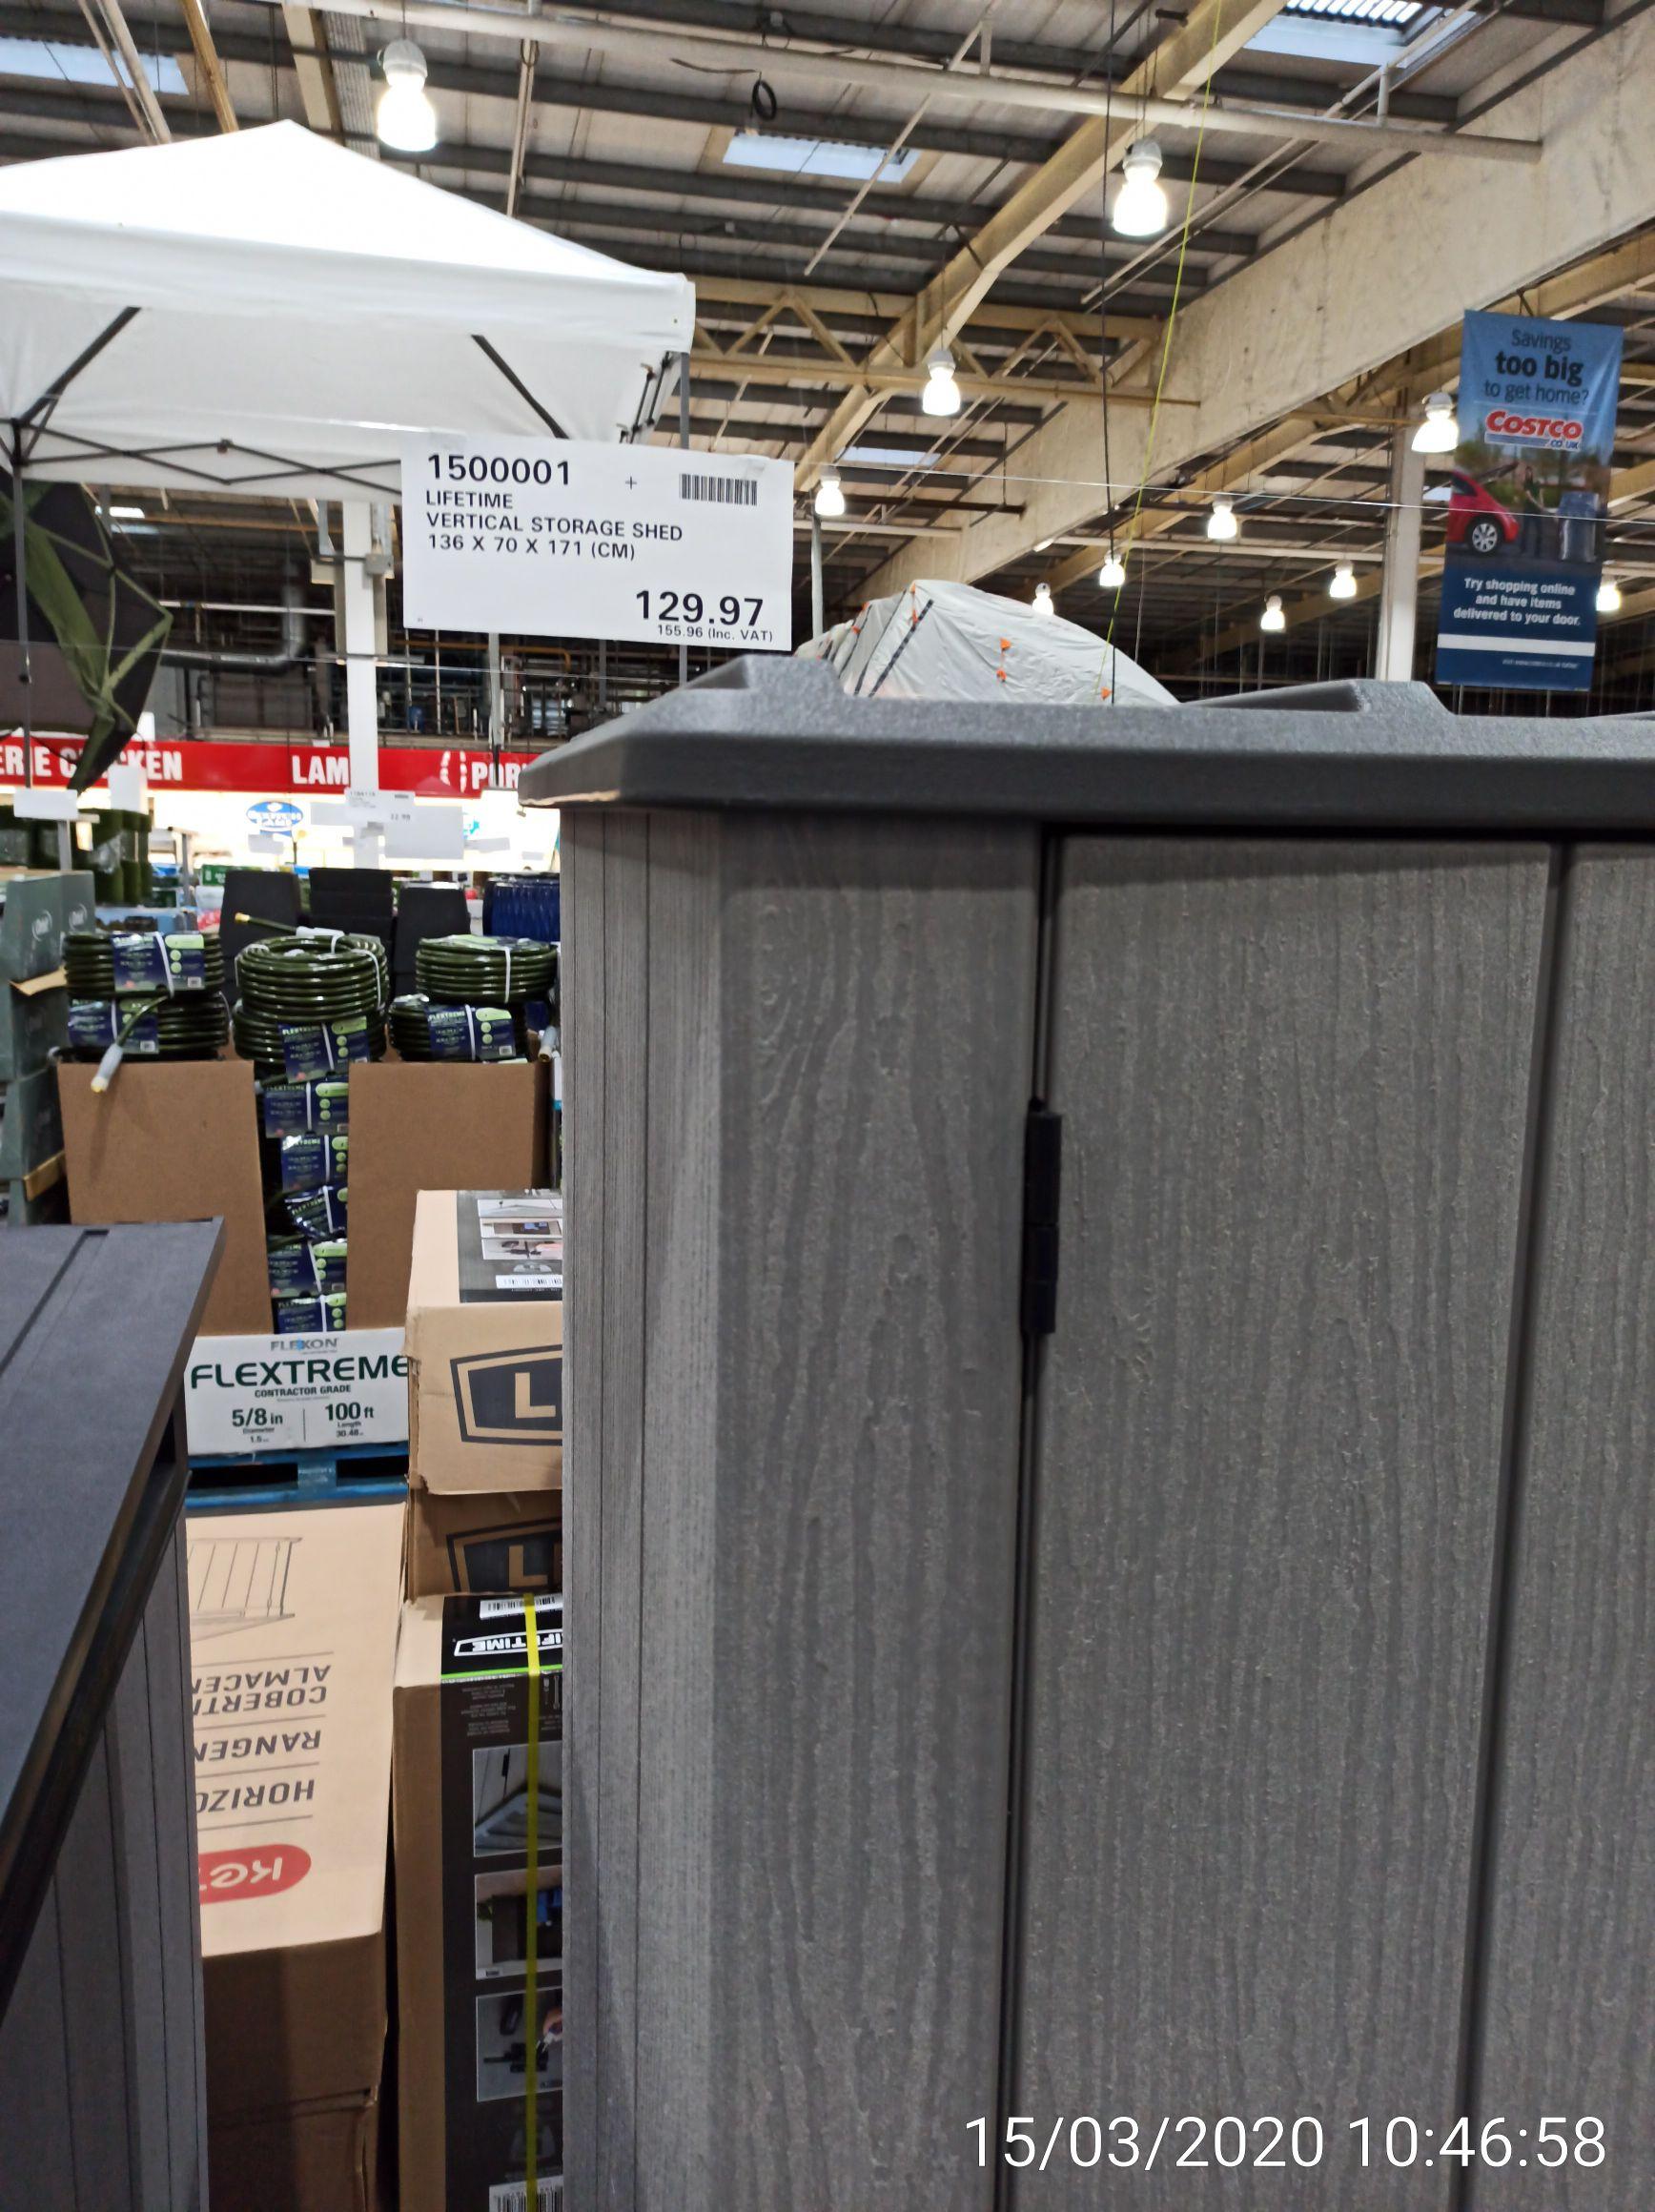 Lifetime Vertical Storage Shed £155.96 - Costco Glasgow